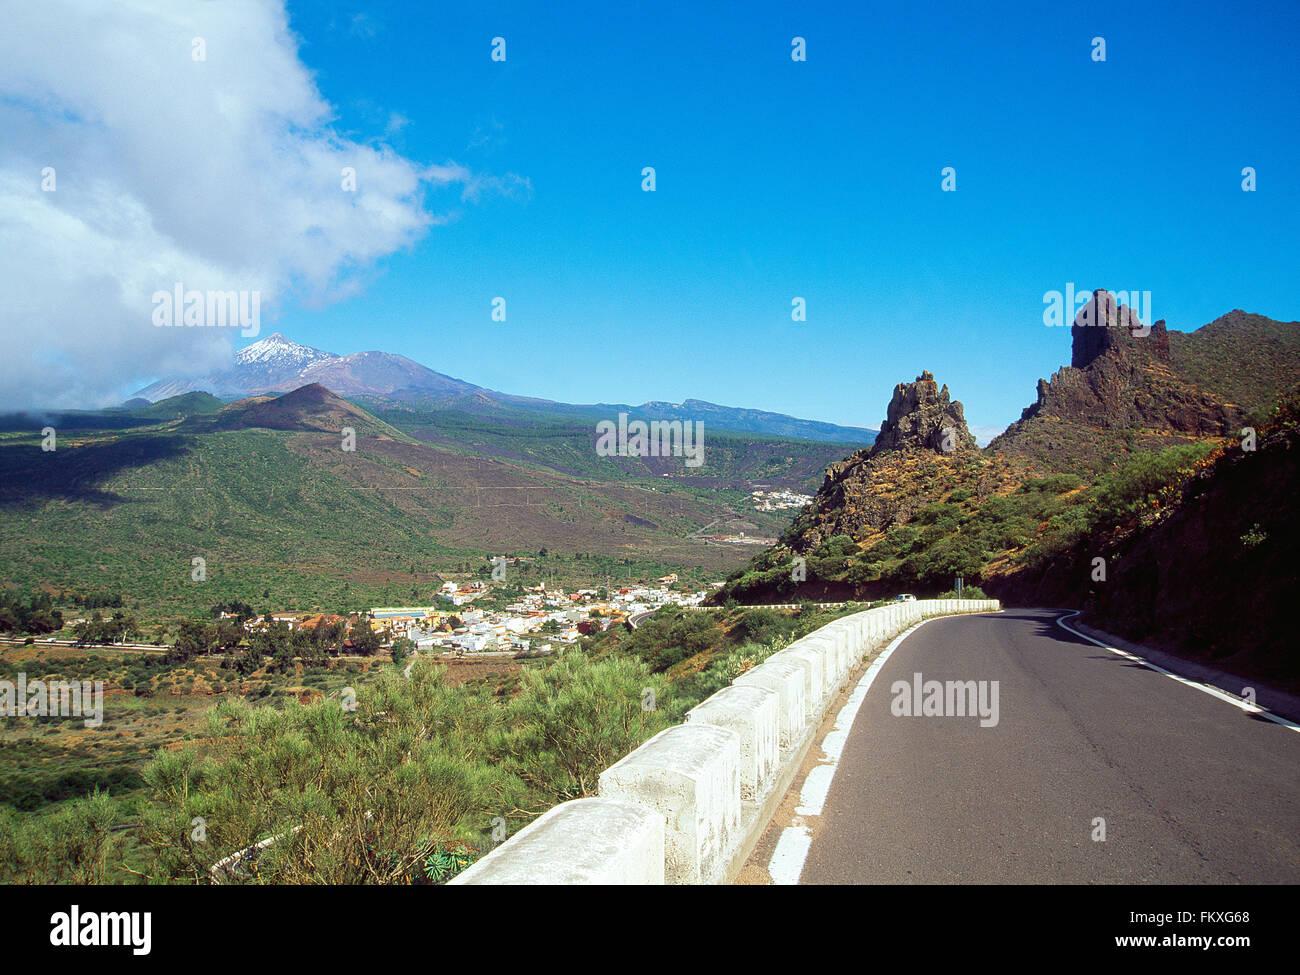 Road to Santiago del Teide and Teide peak. Tenerife island, Canary Islands, Spain. - Stock Image